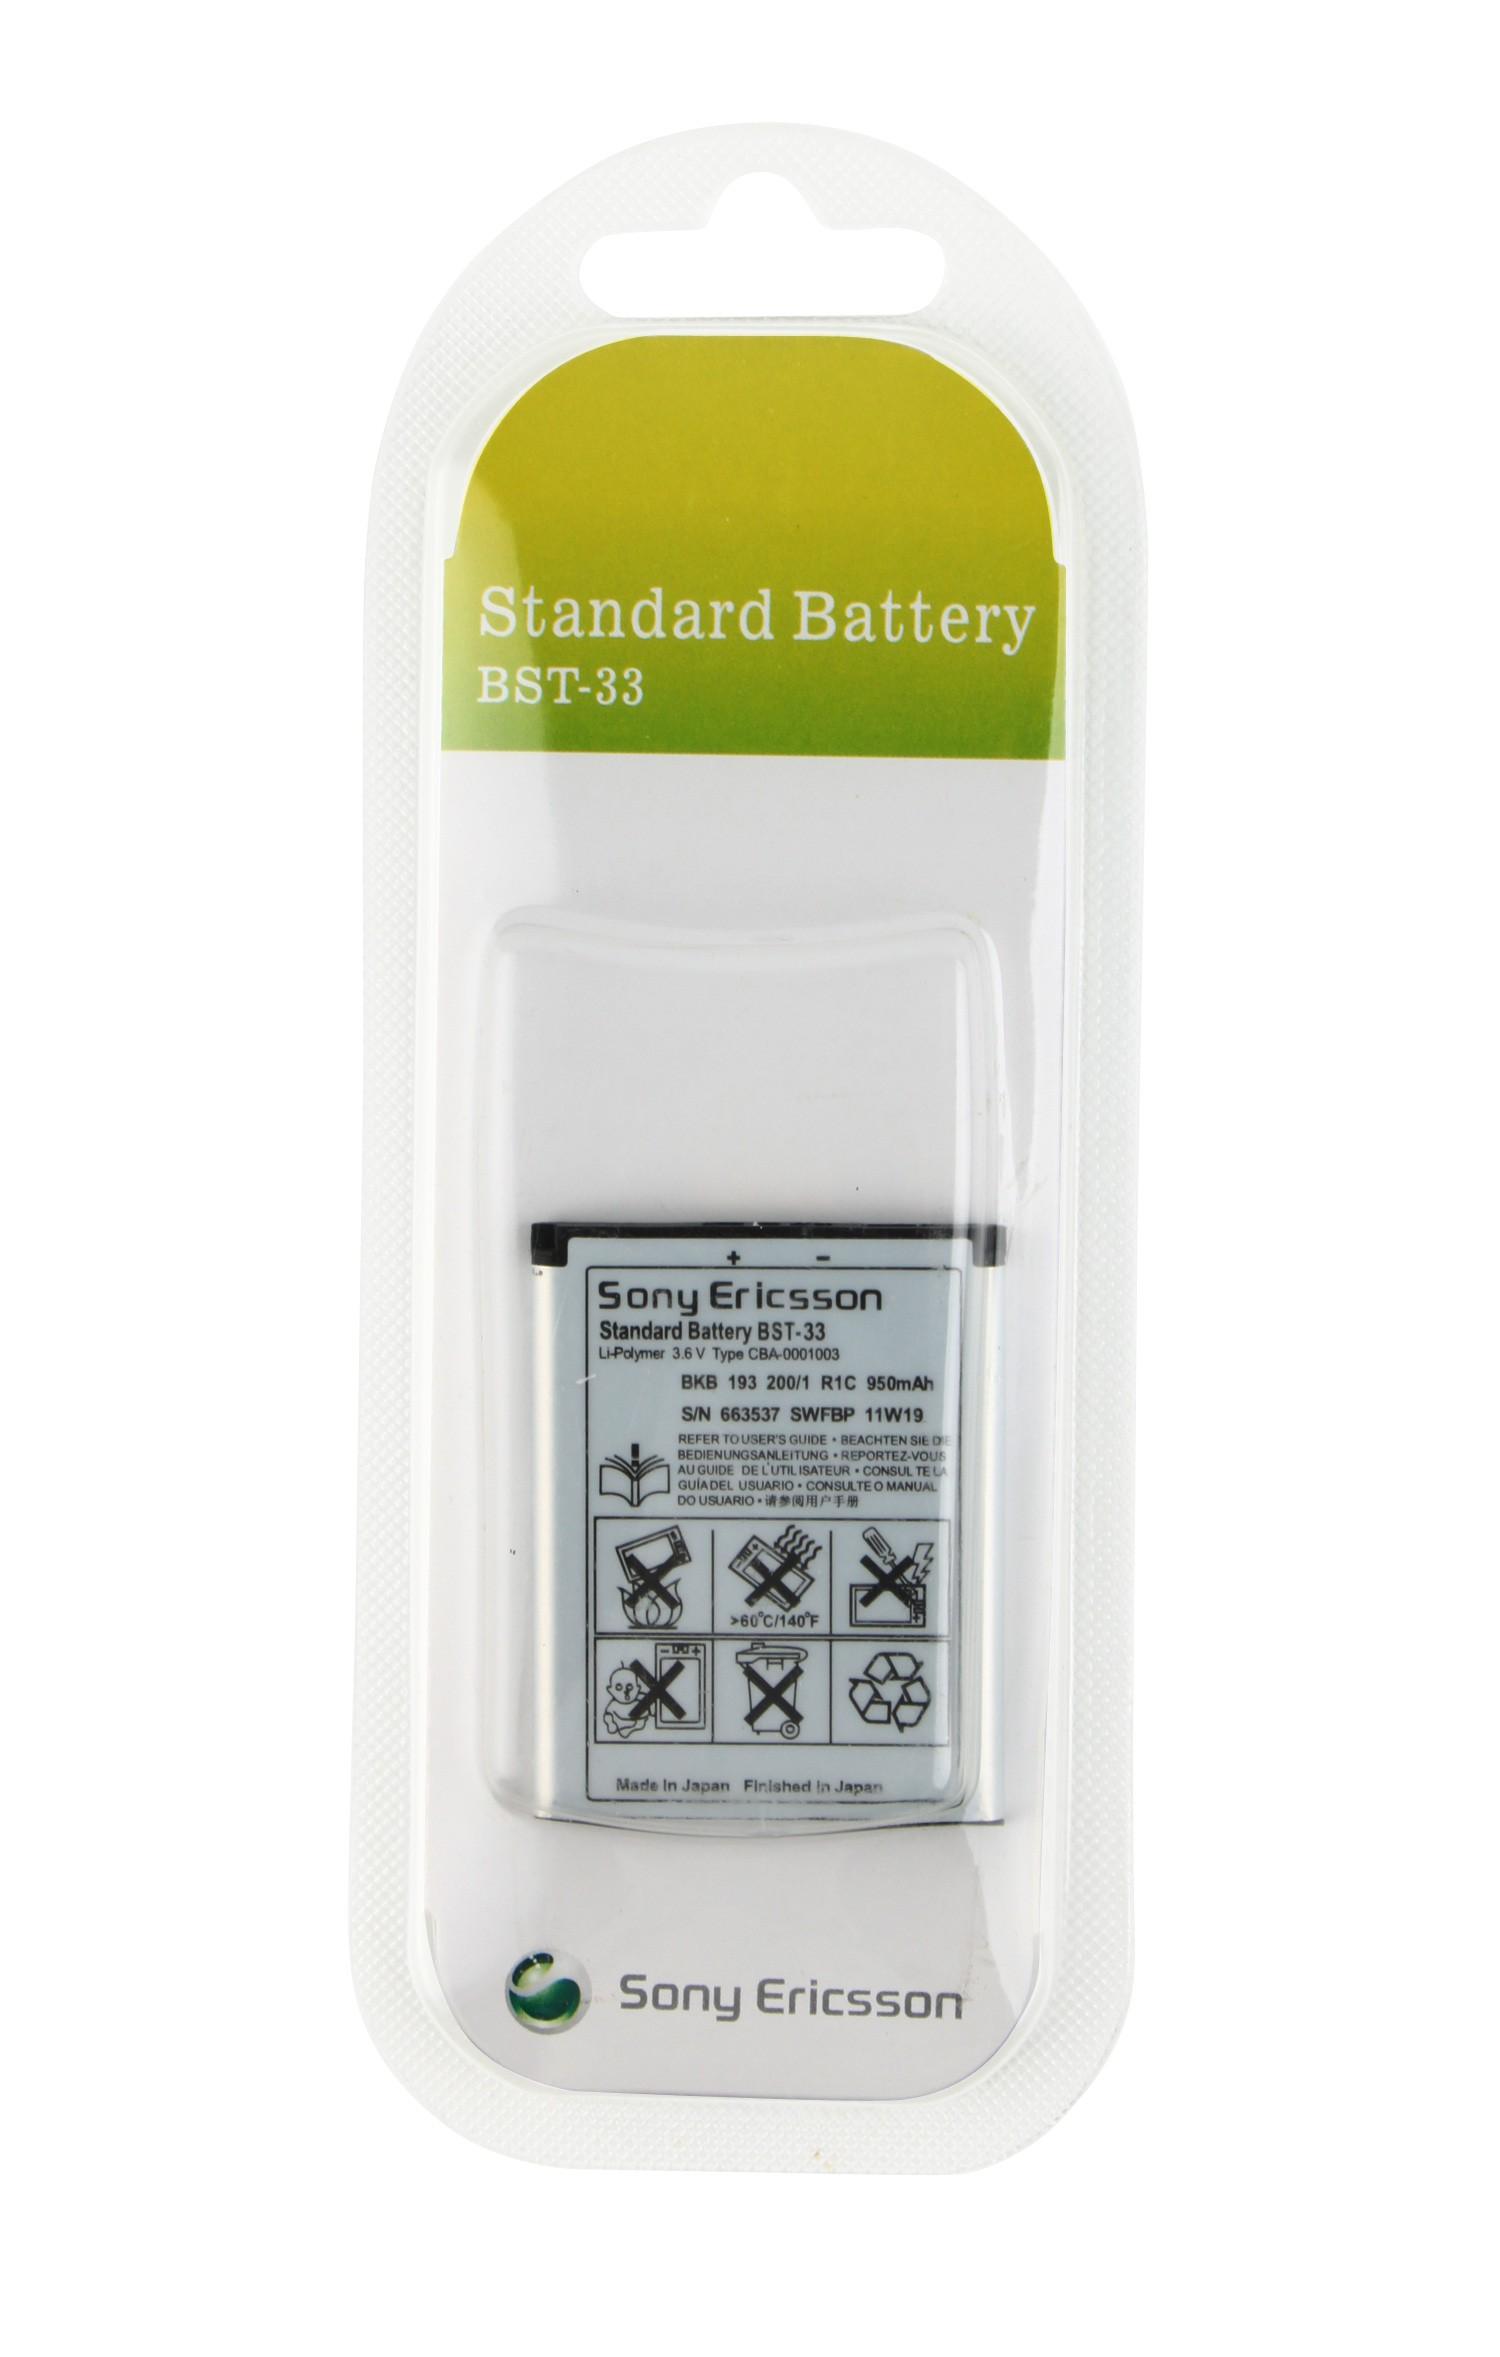 Аккумулятор для Sony Ericsson W960i BST-33 ORIGINAL.